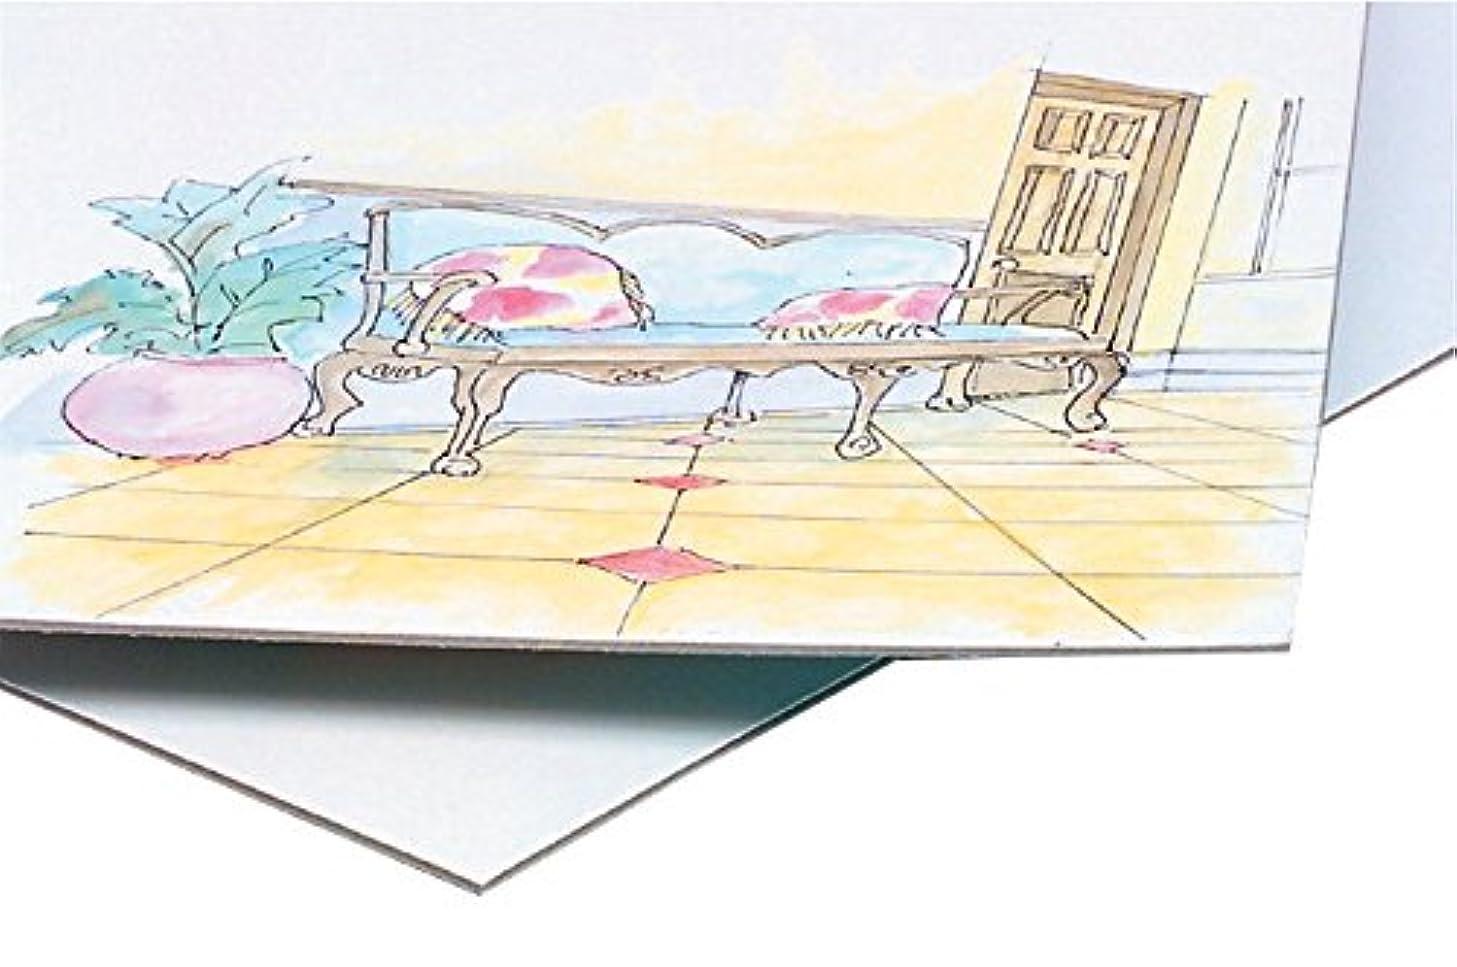 Crescent 405111 Professional Grade Illustration Board, Heavy Weight, 15